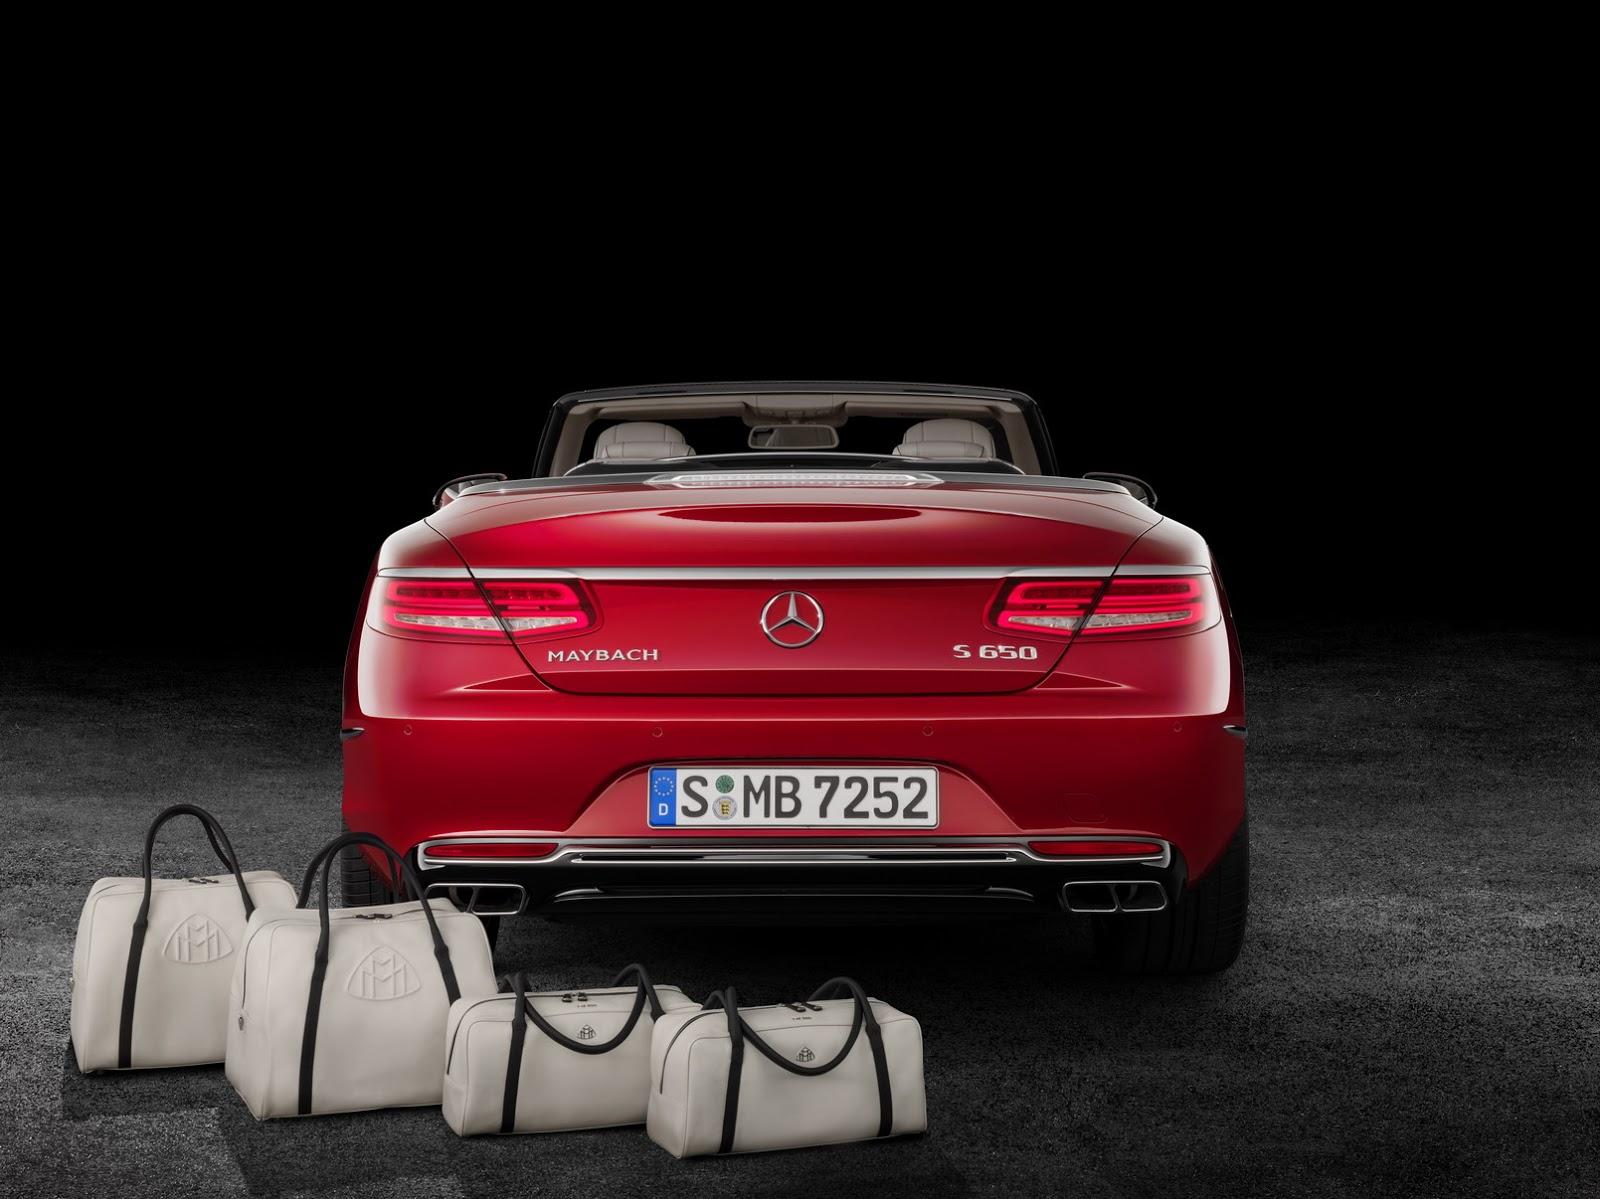 Mercedes-Maybach S 650 Cabriolet (foto ufficiali)